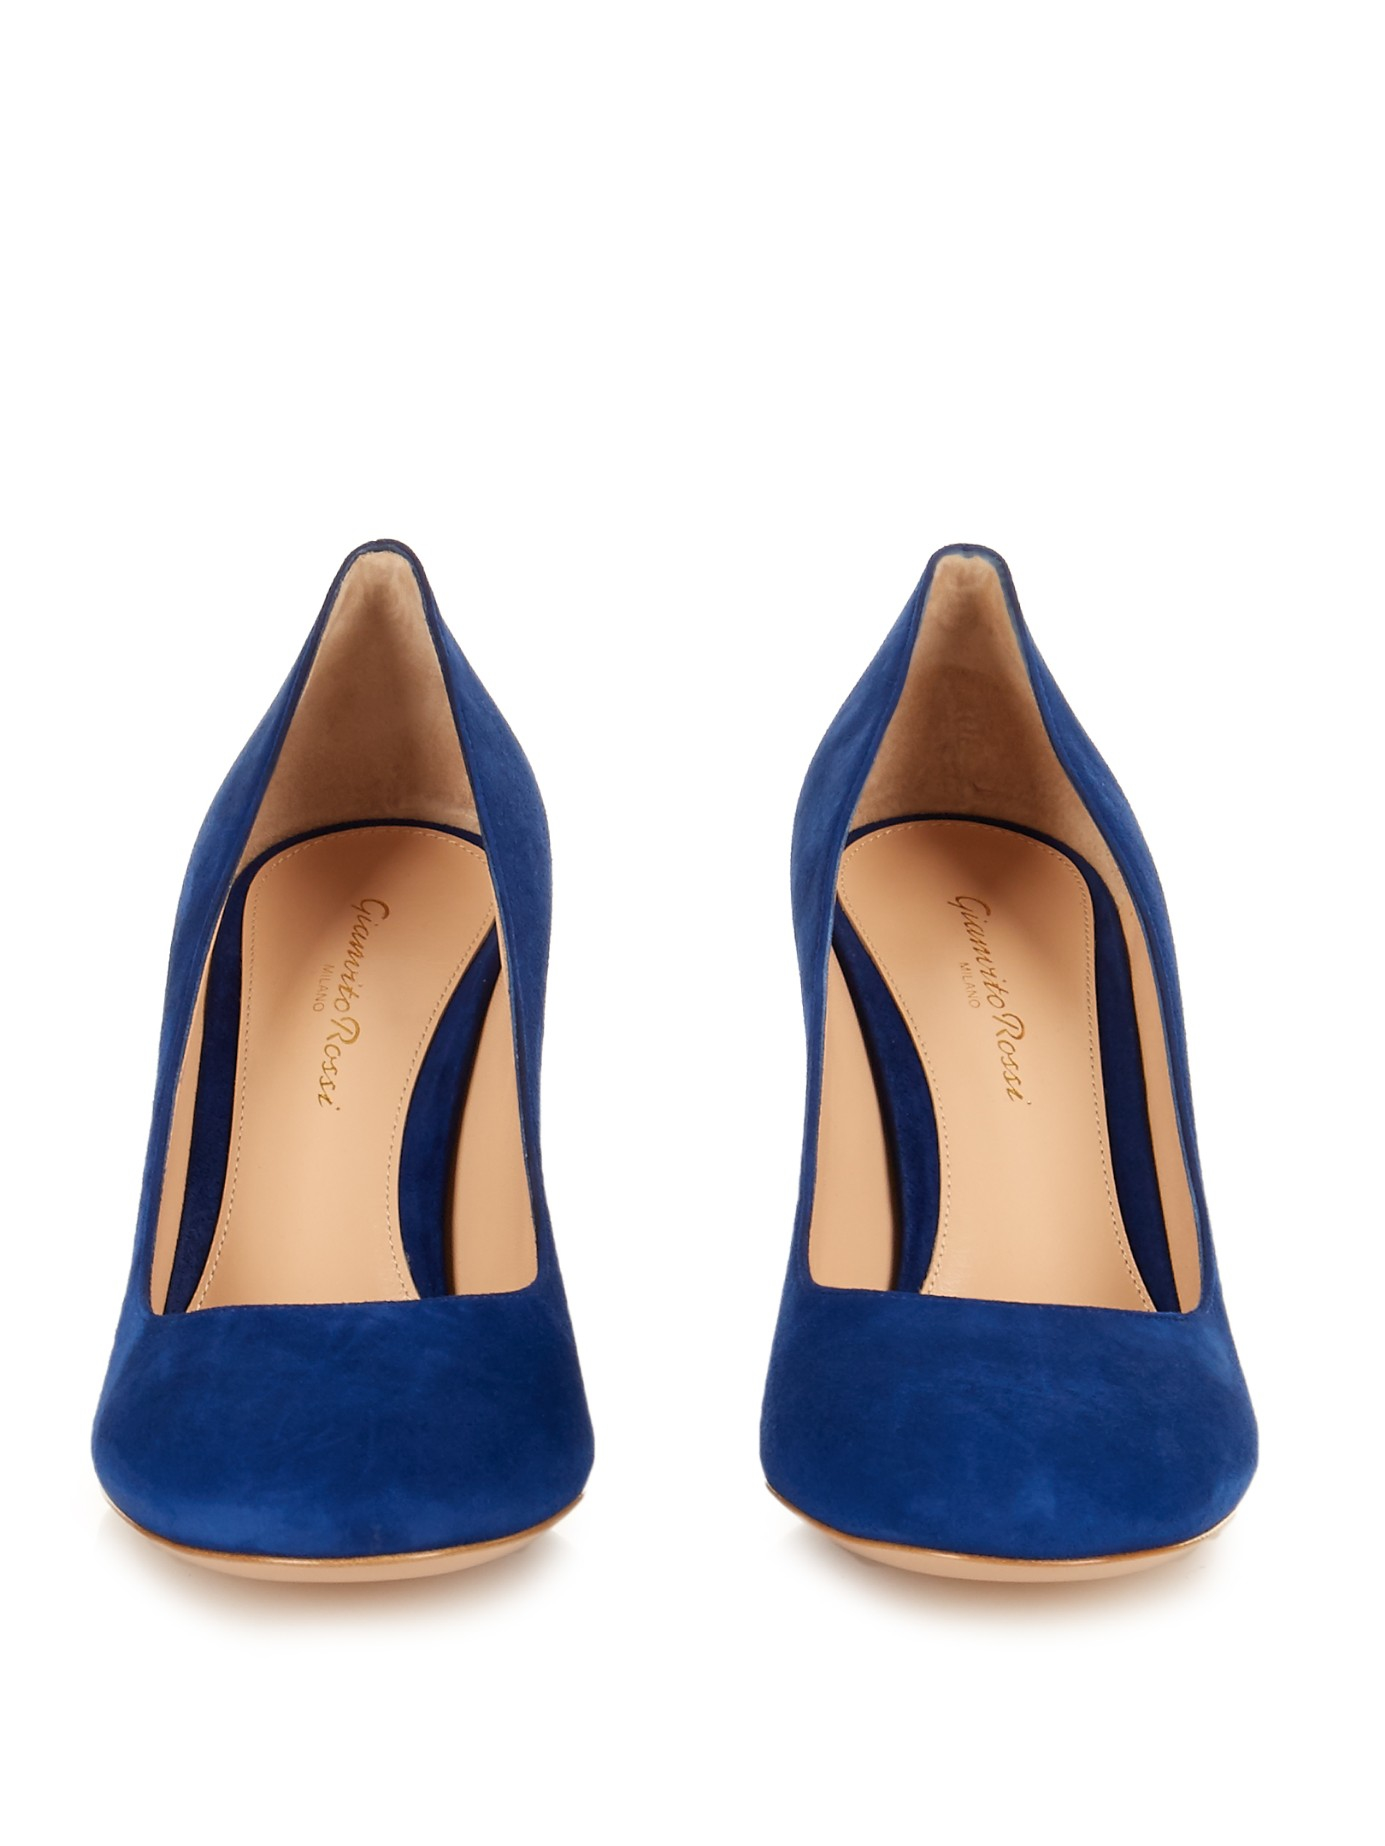 acd7695920c8 Lyst - Gianvito Rossi Linda Suede Pumps in Blue